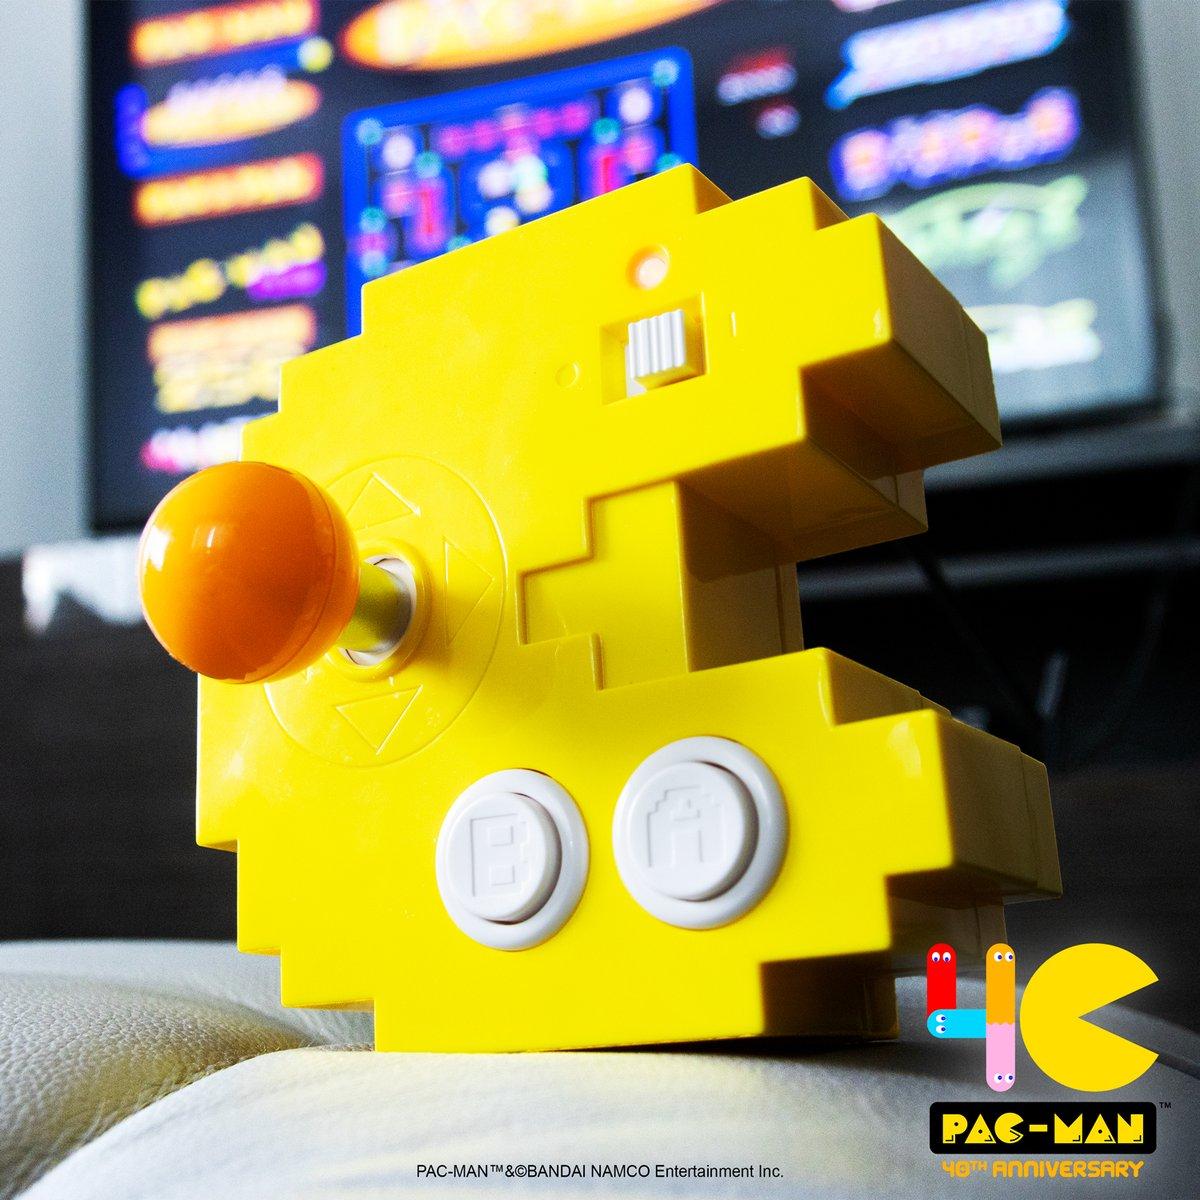 The only way to celebrate #NationalVideoGameDay! 😍  #PacMan #Bandai #BandaiAmerica #BandaiNamco #12gamesin1 #Arcade #Arcadeclassics https://t.co/vyBhcv90fE